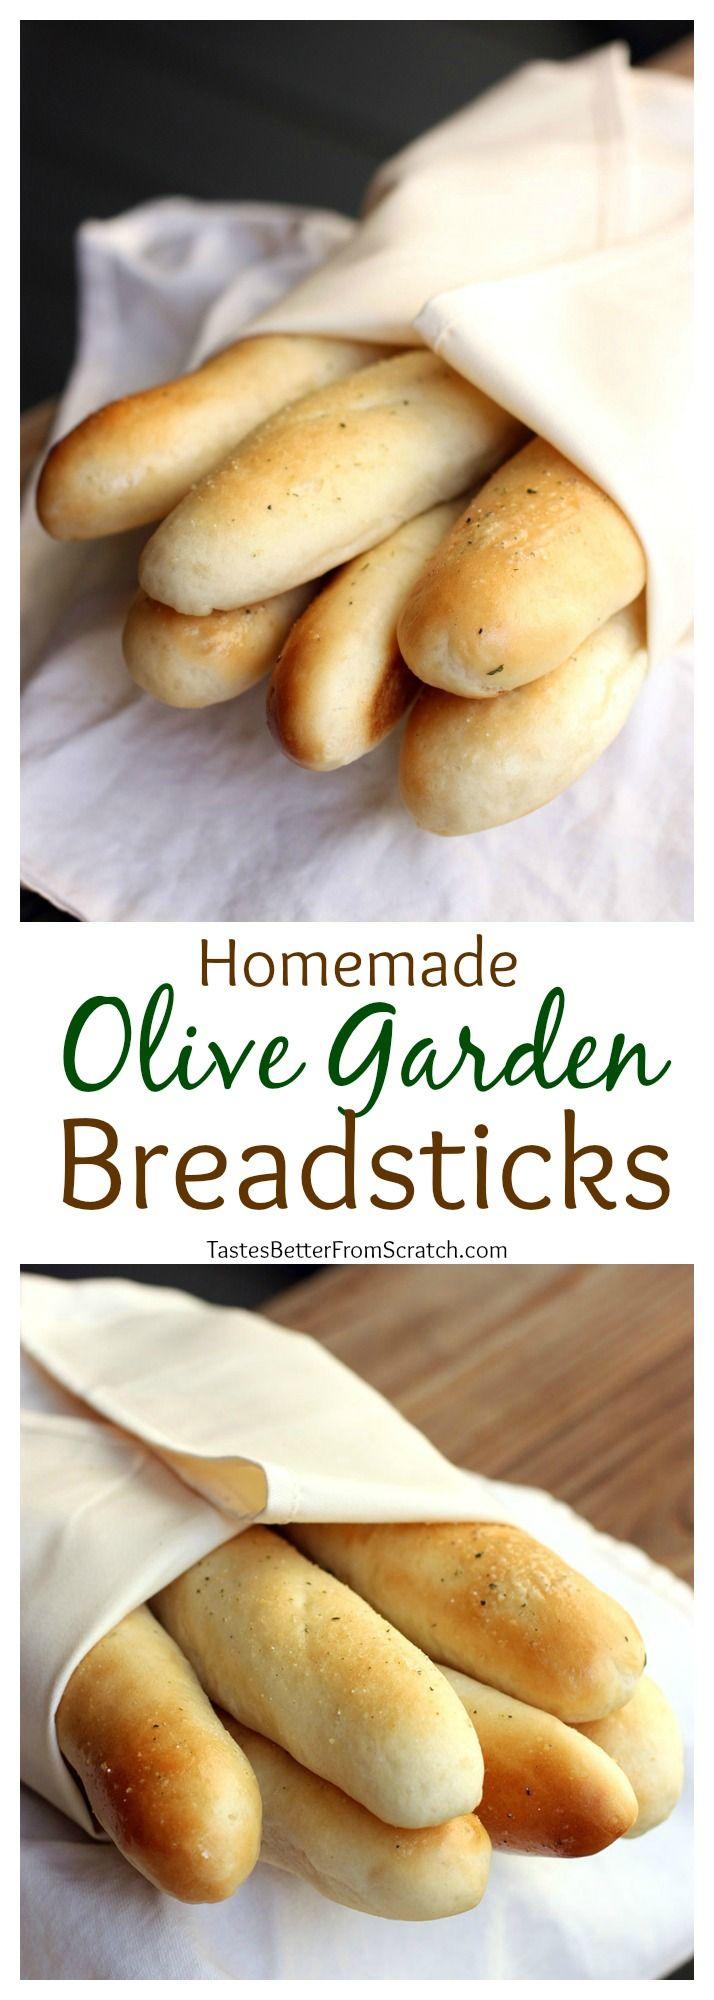 Copycat Olive Garden Breadsticks that tastes just as good as the restaurants…